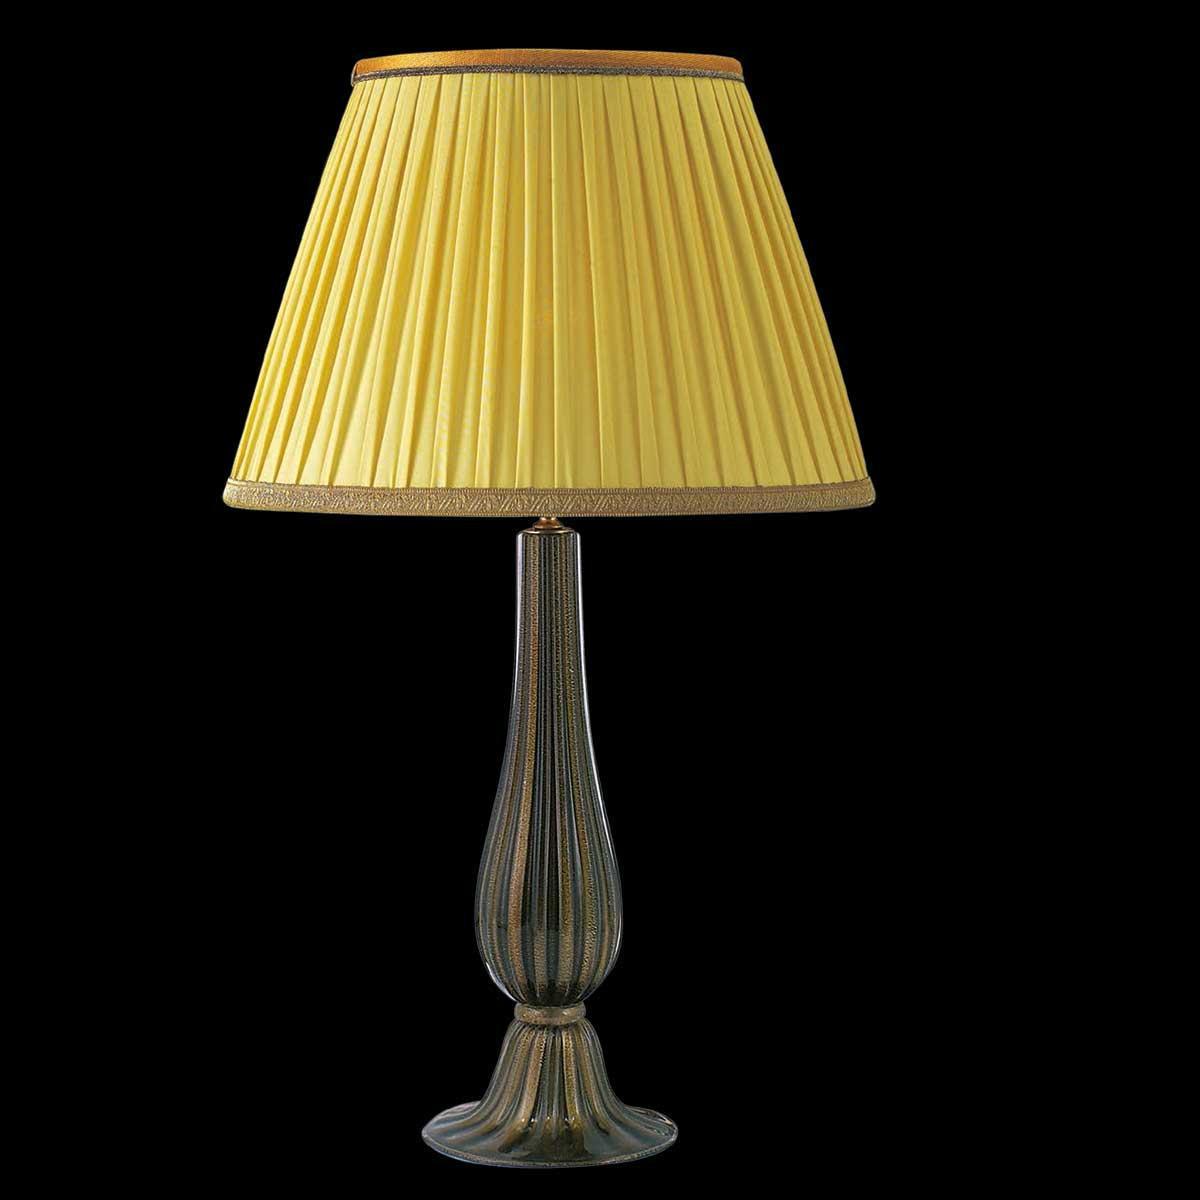 uranio lampe de table en verre de murano murano glass. Black Bedroom Furniture Sets. Home Design Ideas